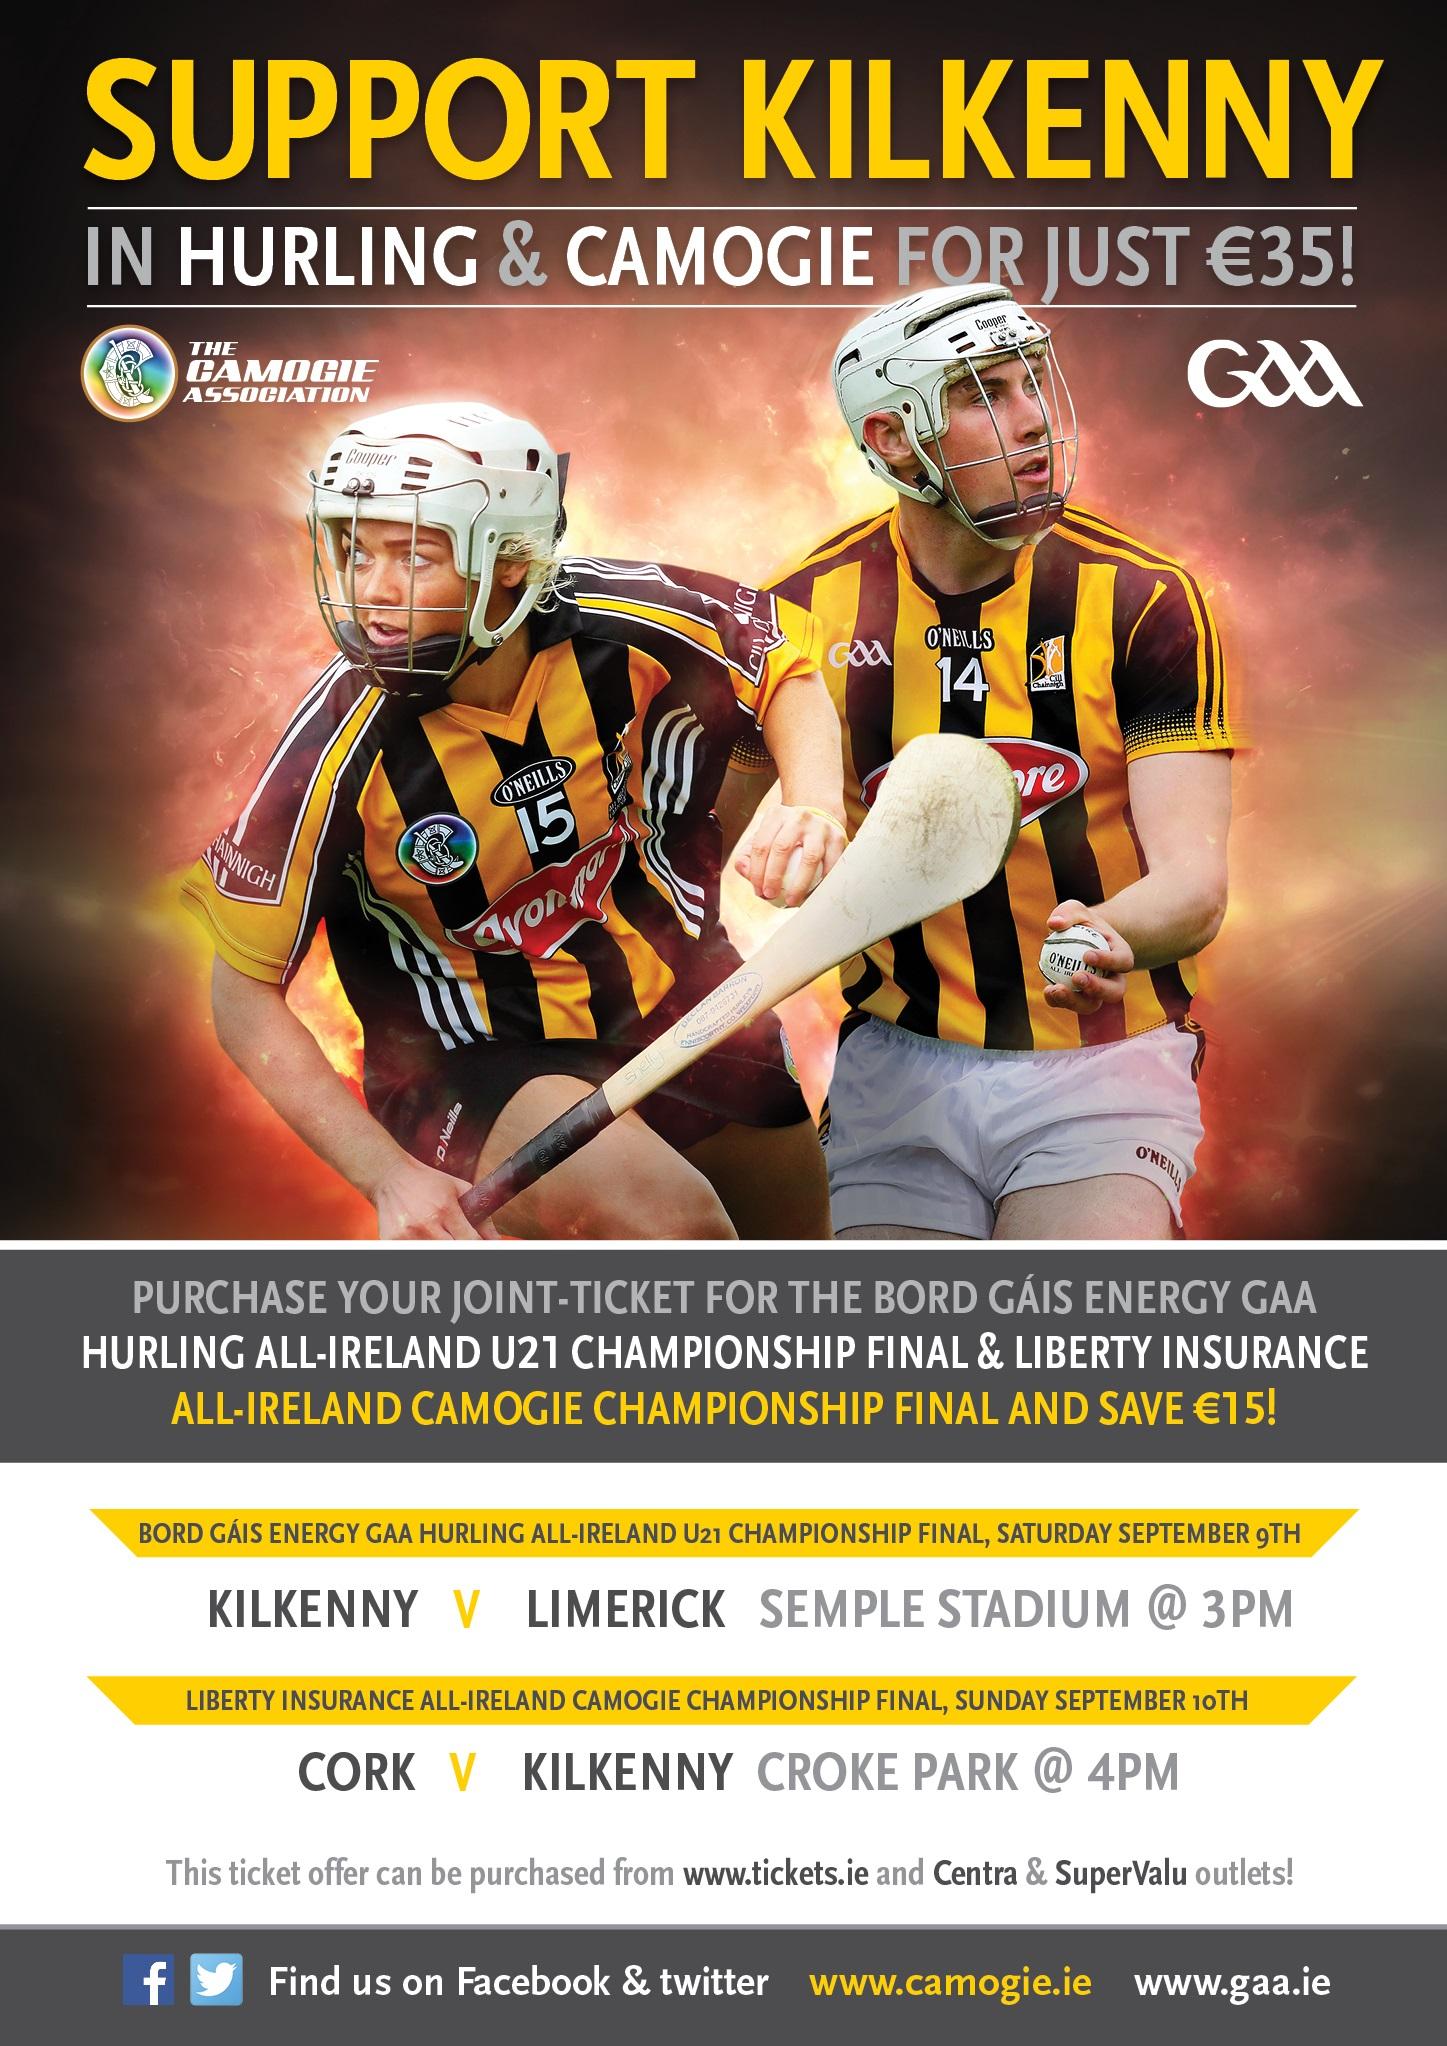 Kilkenny_HurlingCamogie_A4